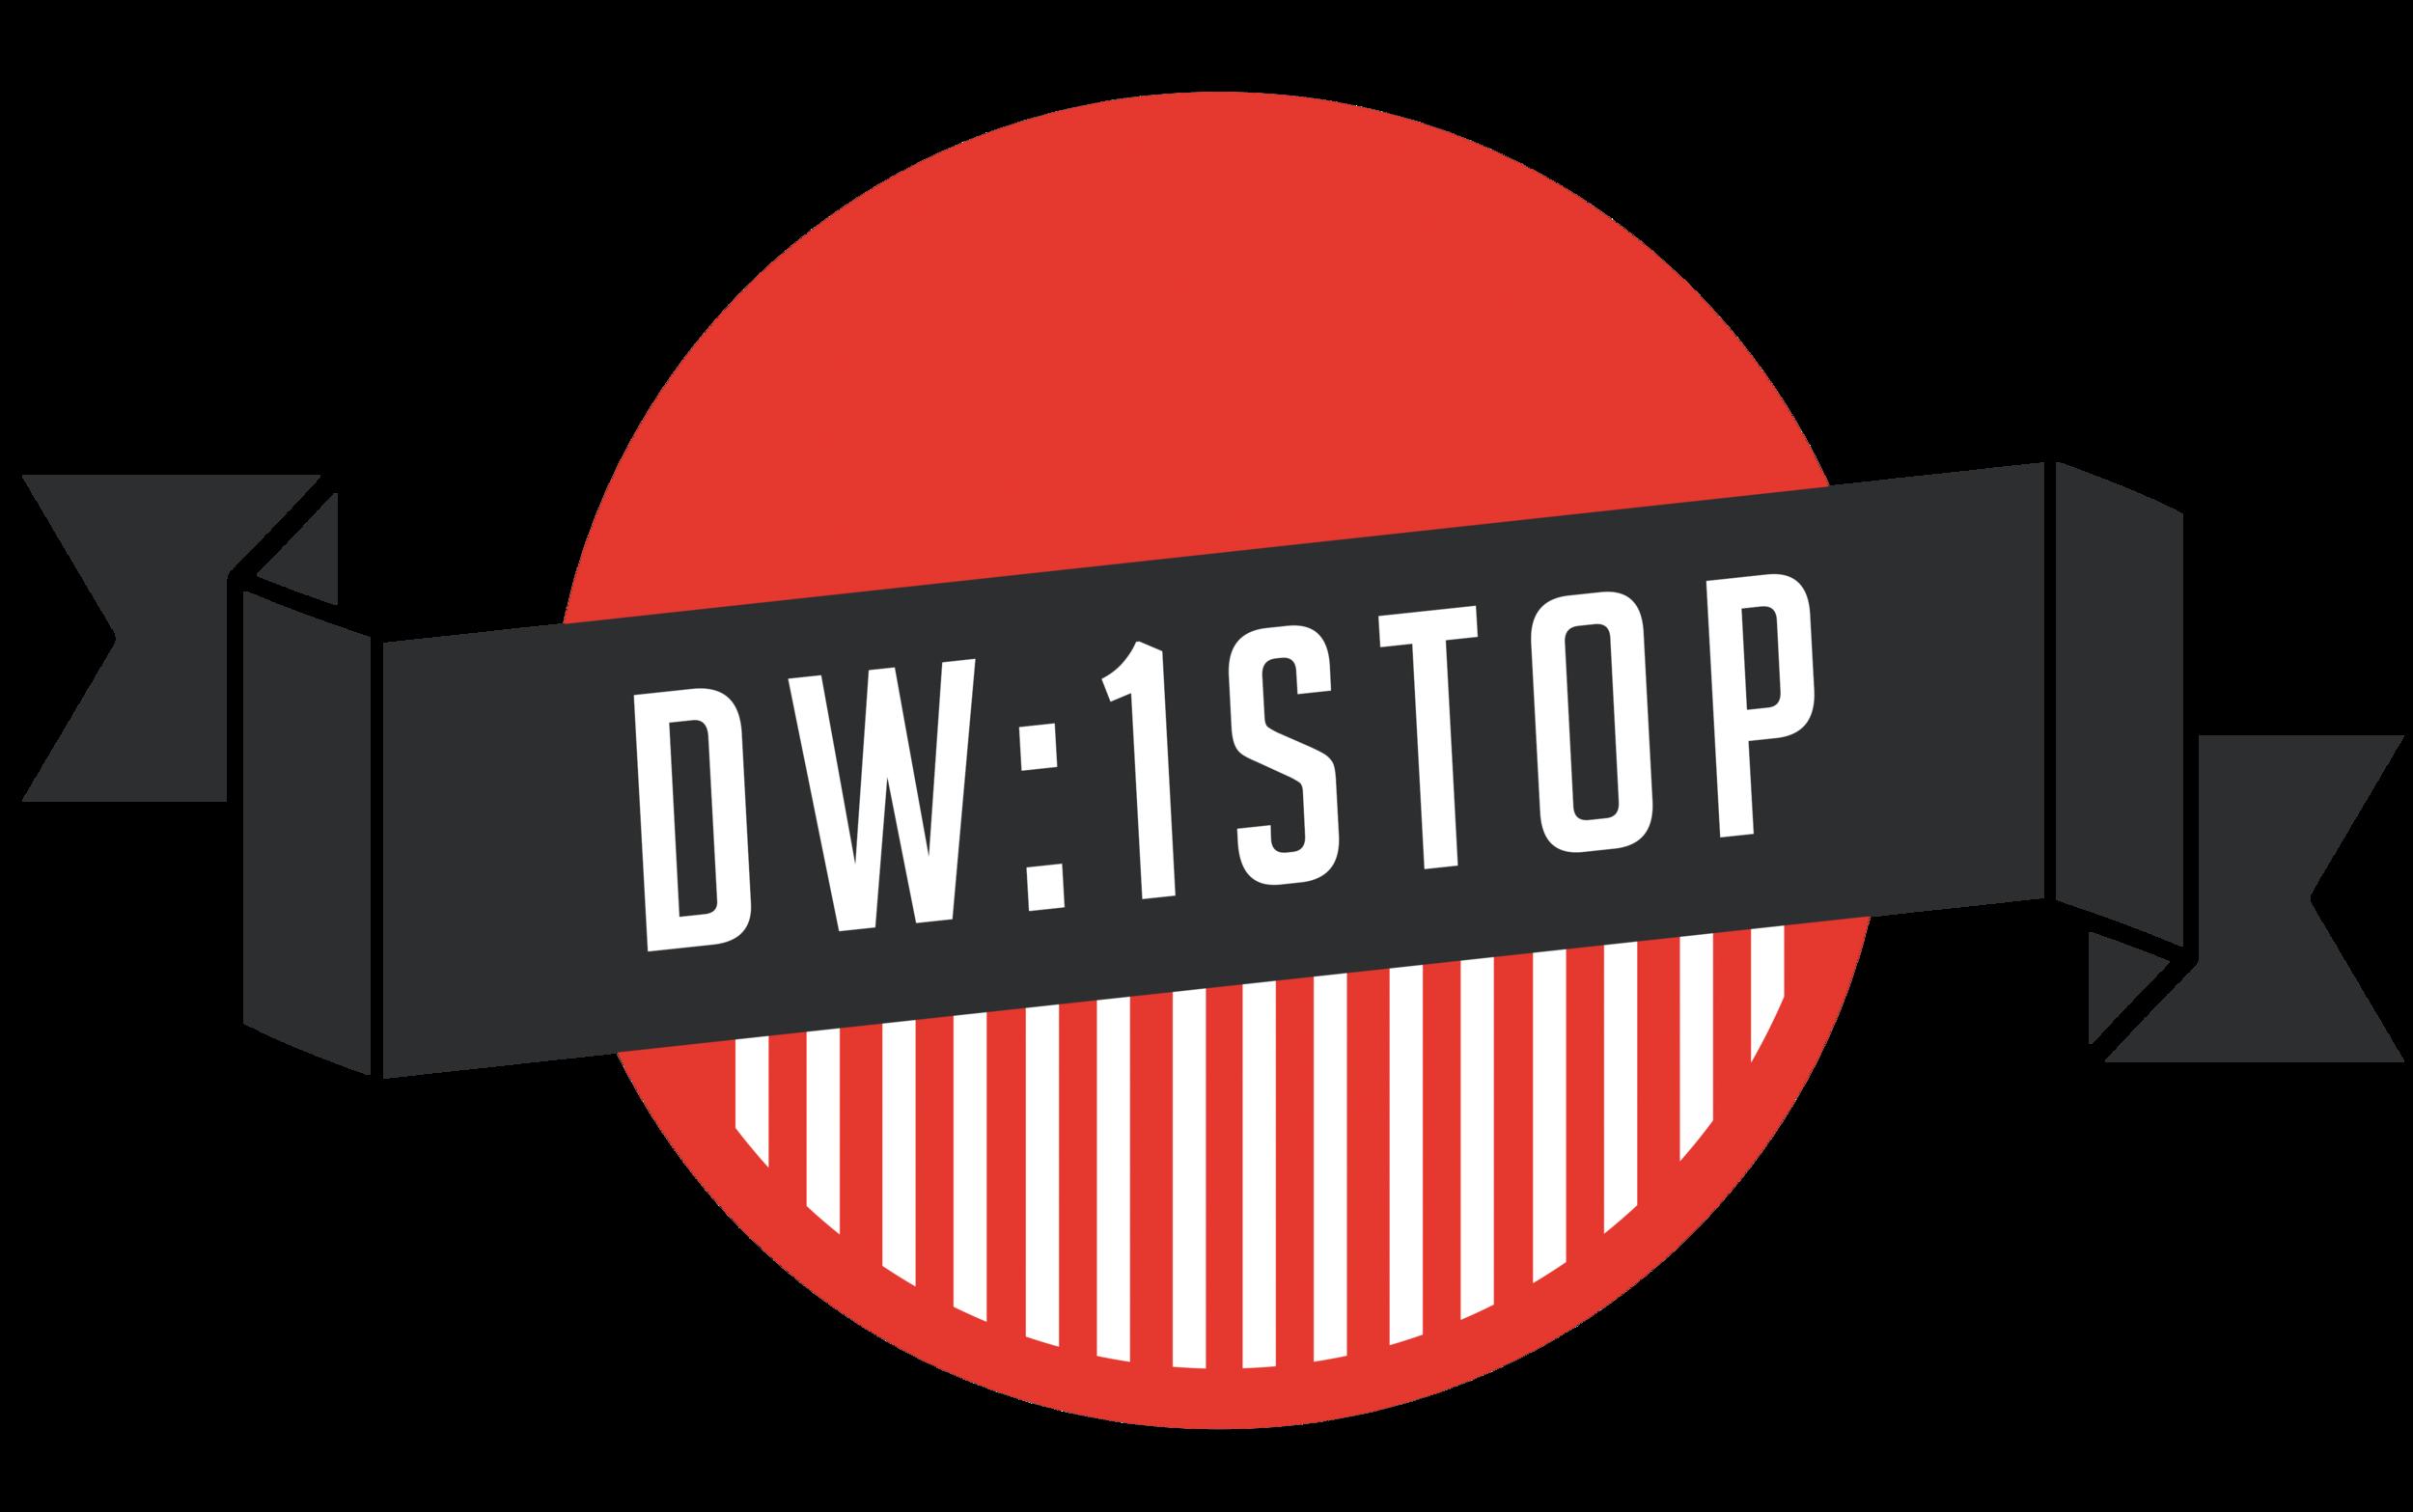 dw1stop-logo-red.png